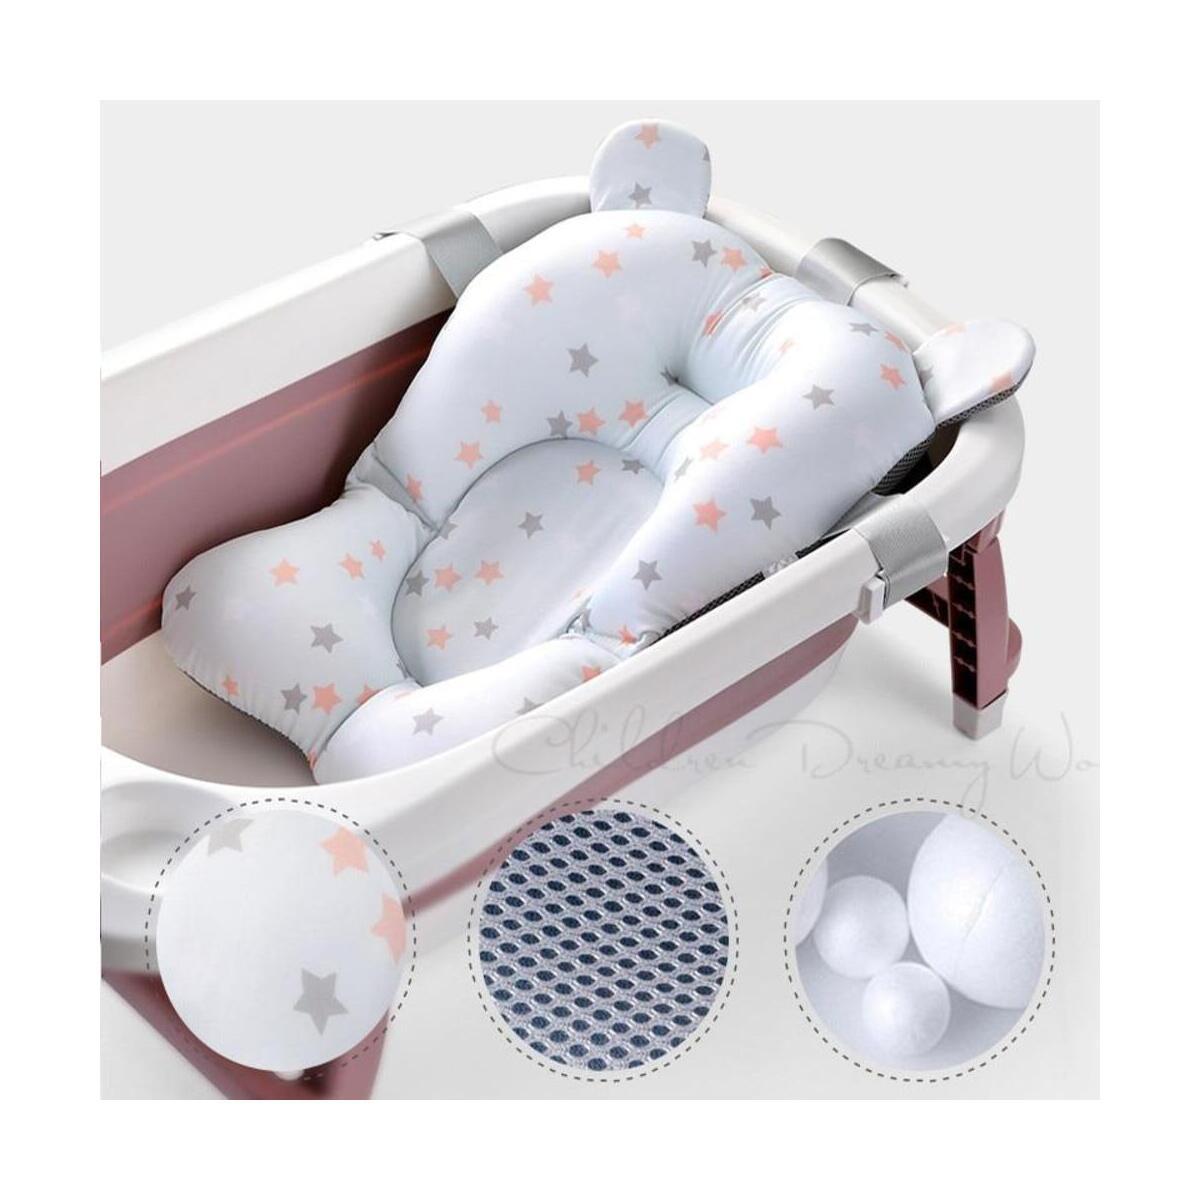 Baby Bath Cushion Support Mat Seat Support Mat Foldable Infant Anti-Slip Bath Cushion Soft Mat